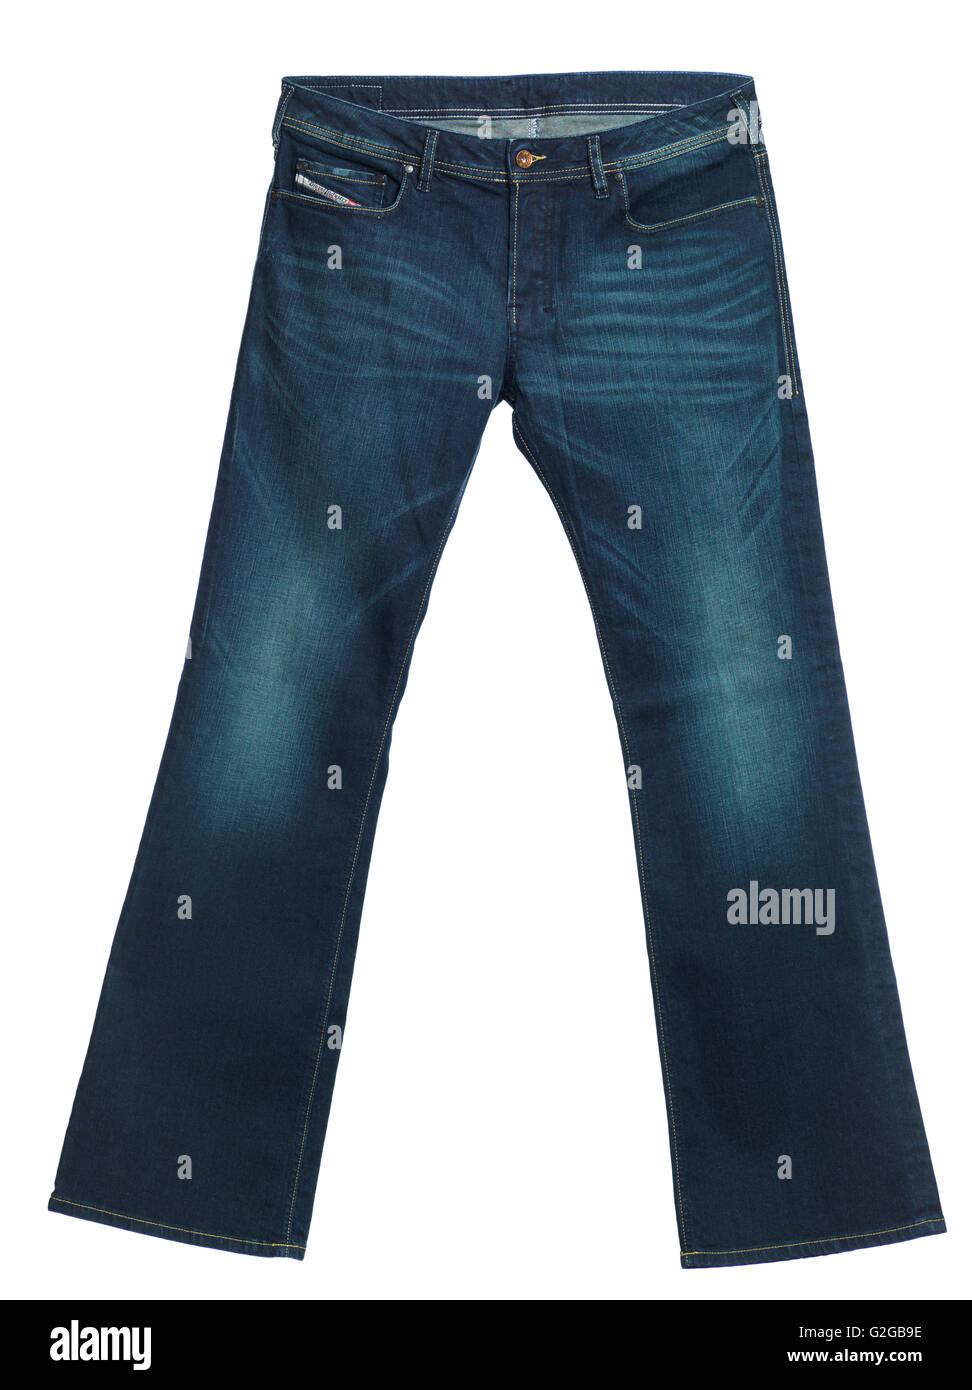 Diesel jeans Zathan, men's boot-cut washed denim pants - Stock Image